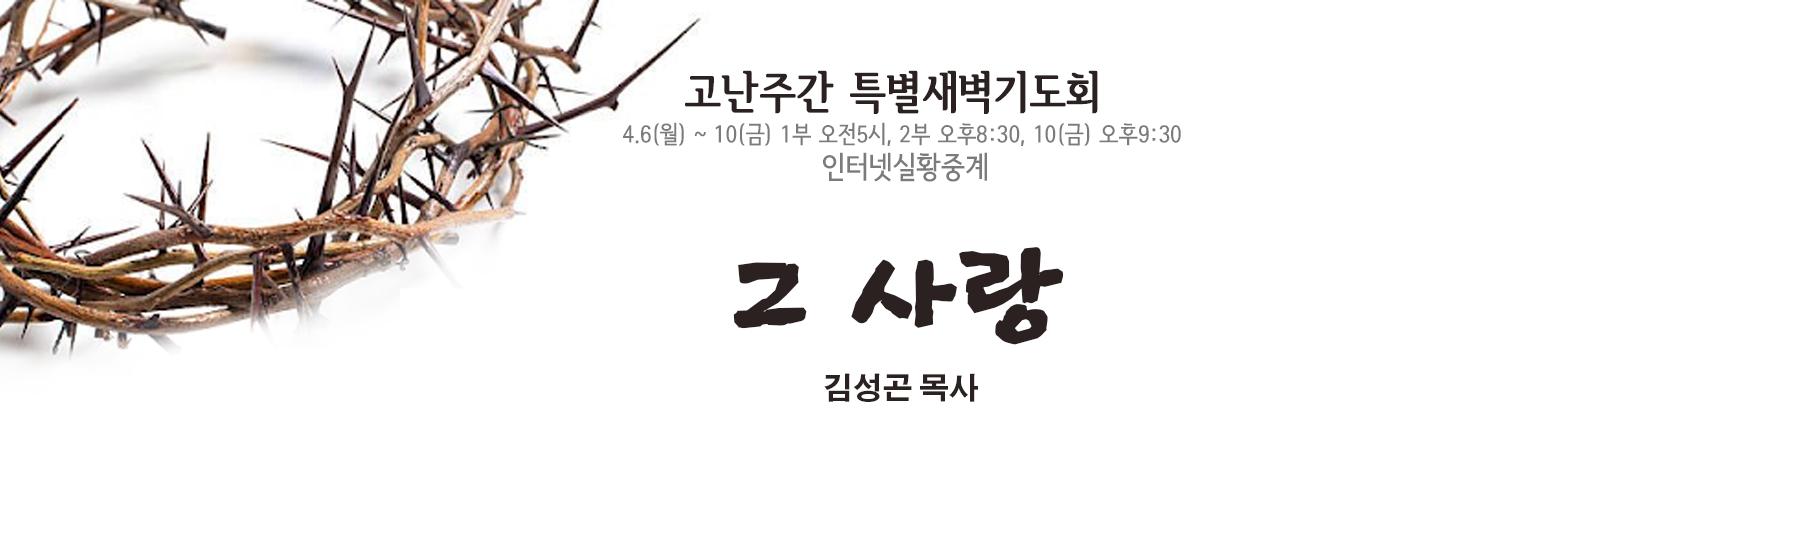 psh-banner-고난주간